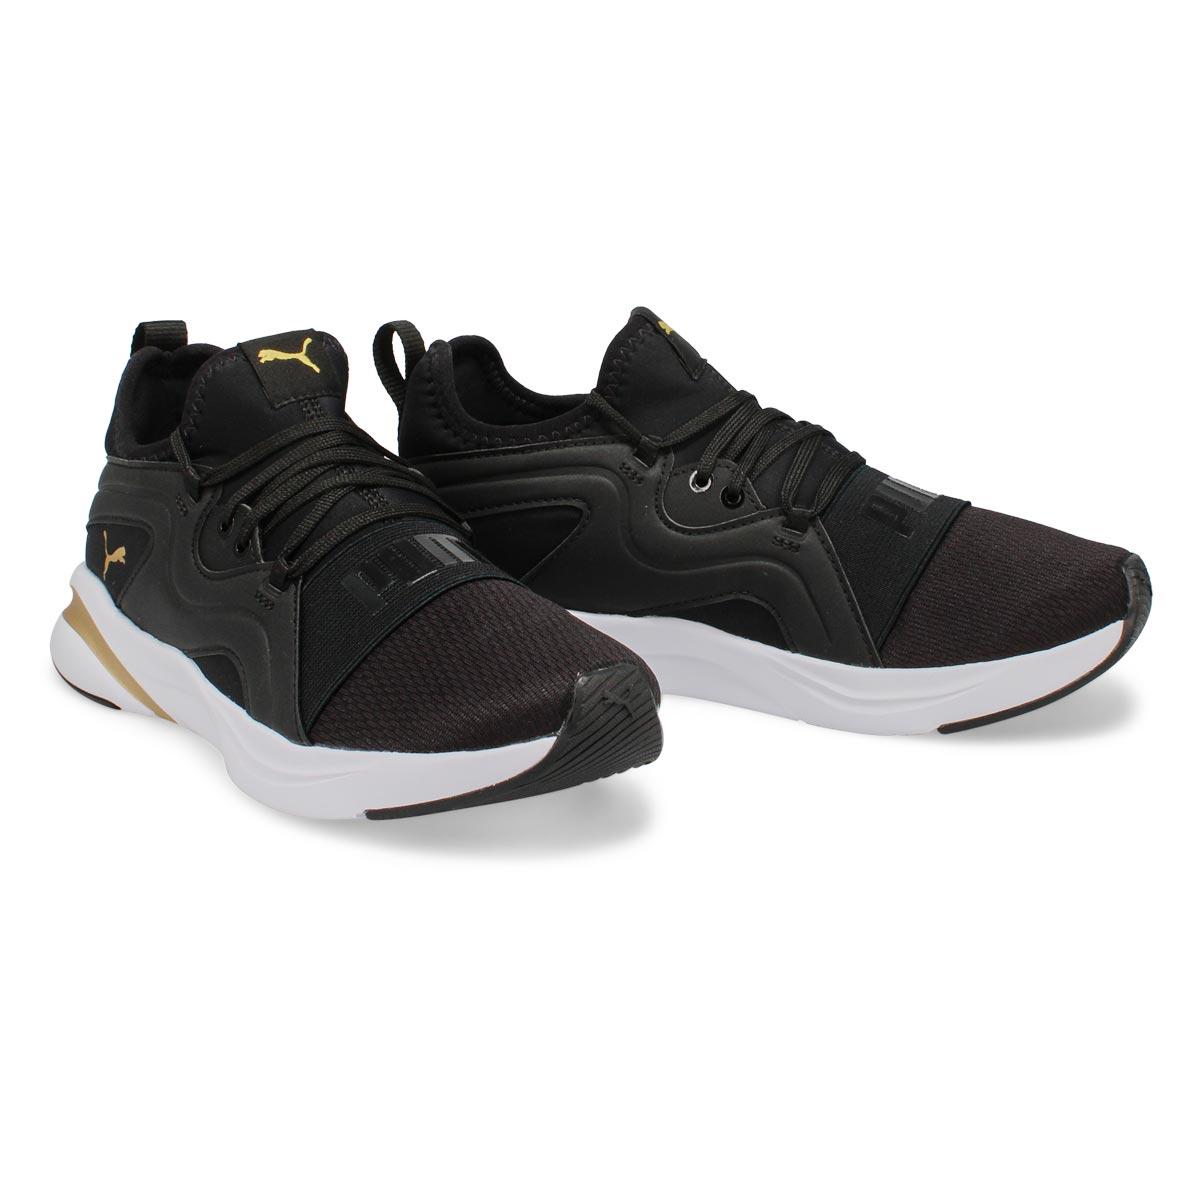 Women's Softride Rift Breeze Sneaker - Blk/Gold